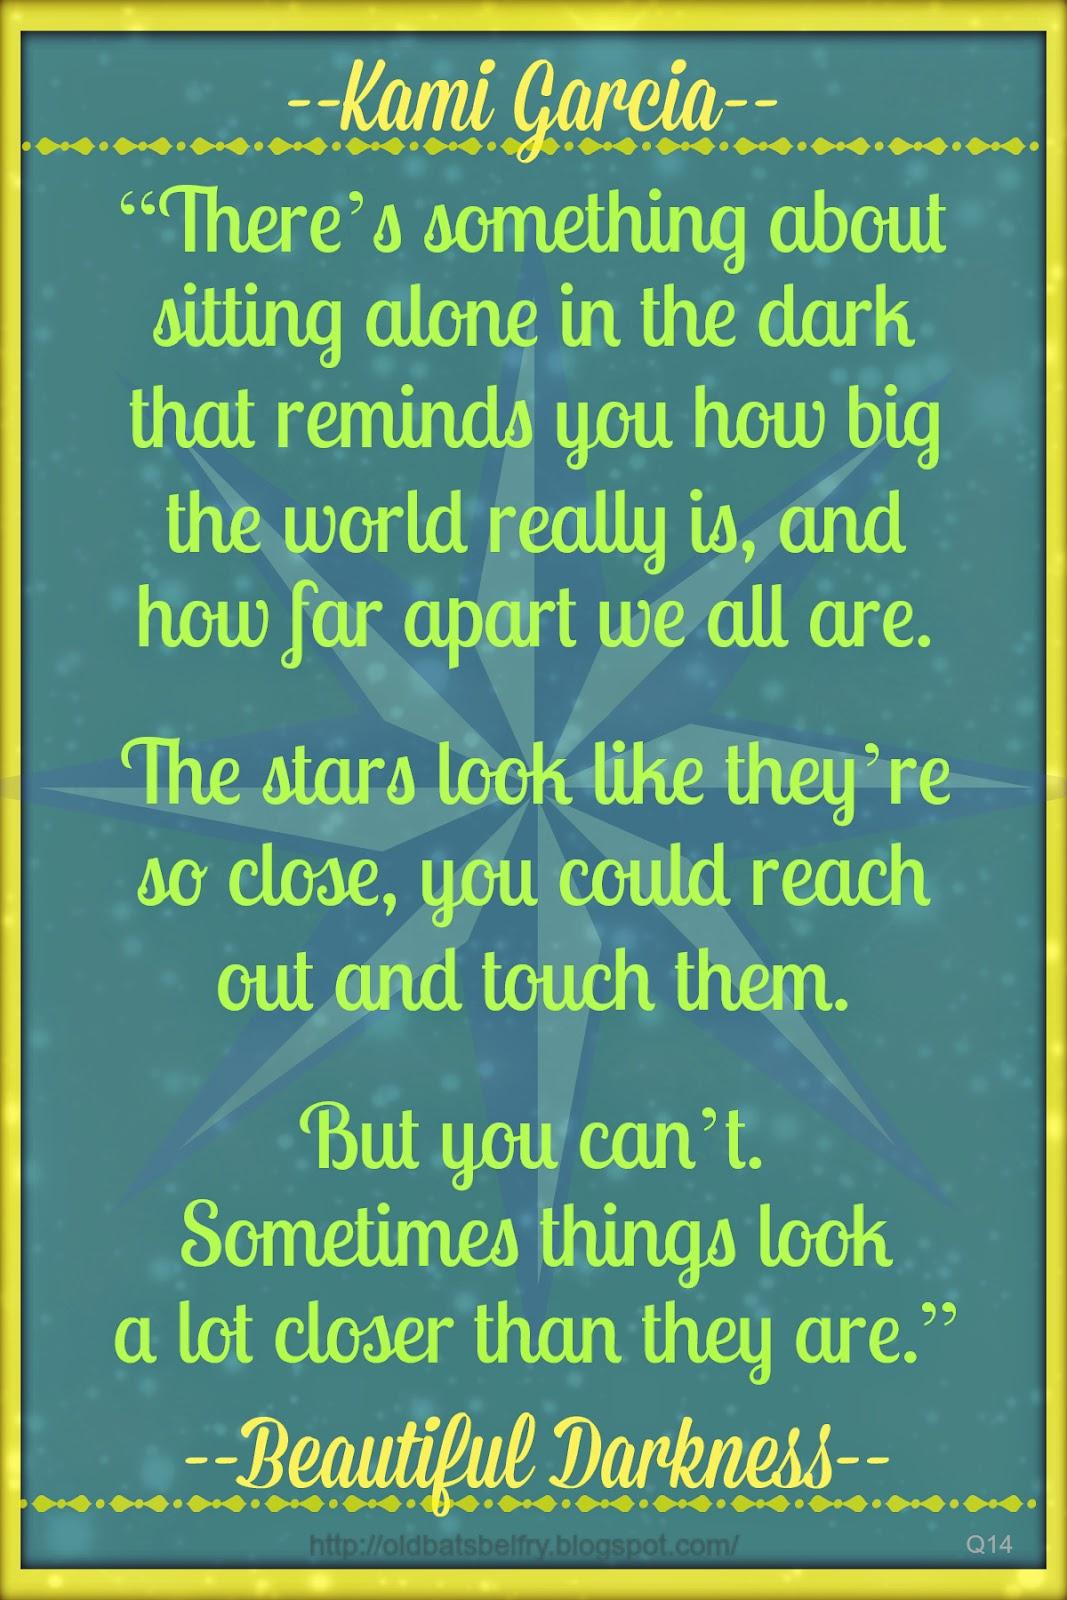 Quote by Kami Gargia ~ Design by Mulluane